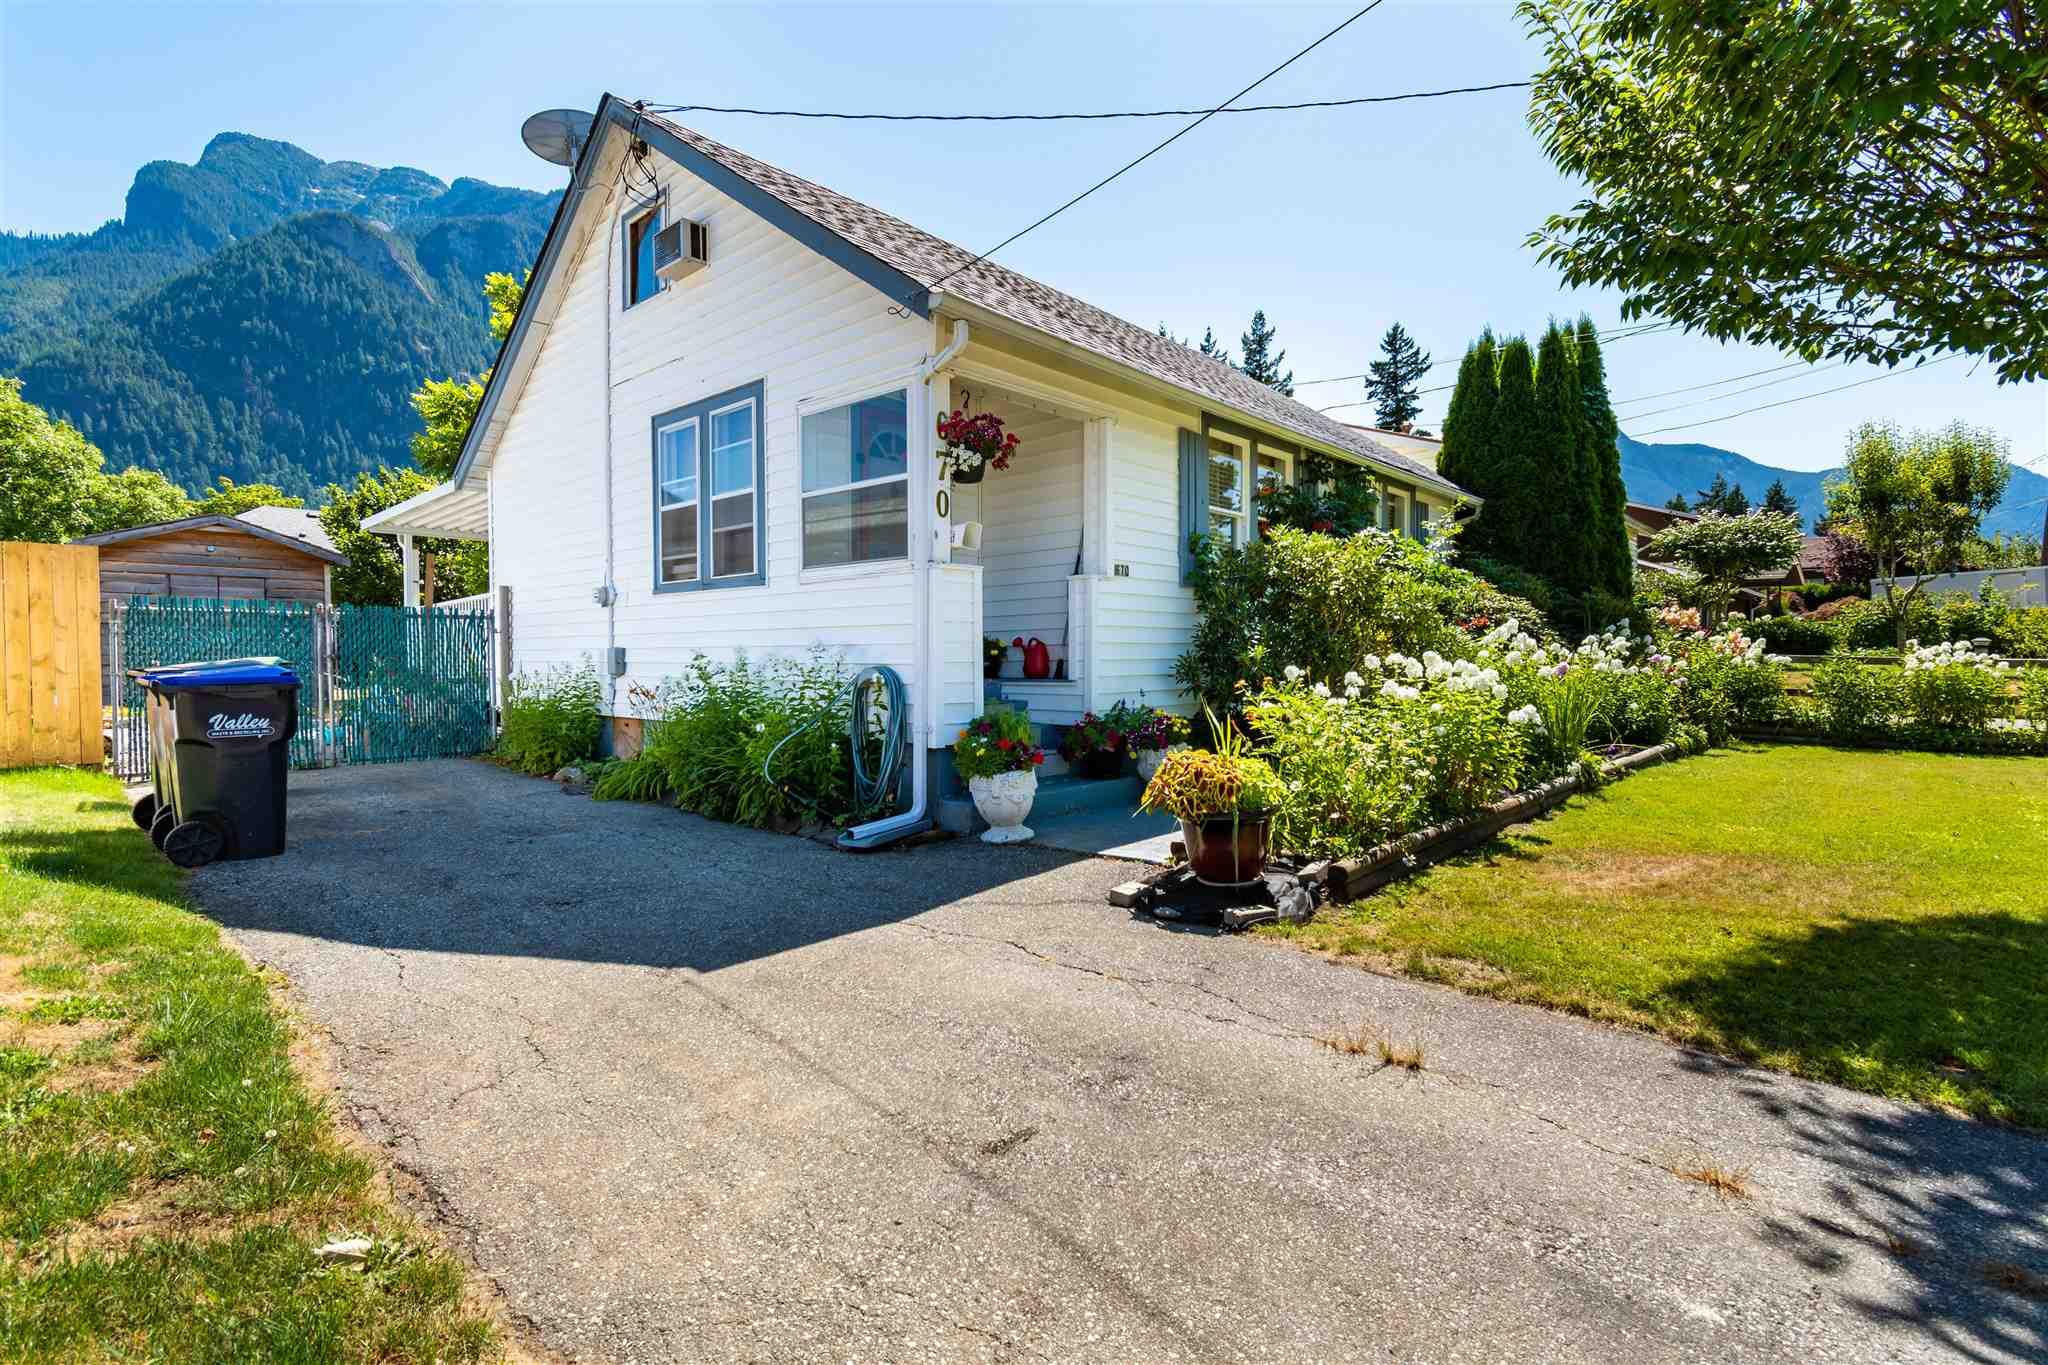 670 PARK STREET - Hope Center House/Single Family for sale, 2 Bedrooms (R2604007) - #1